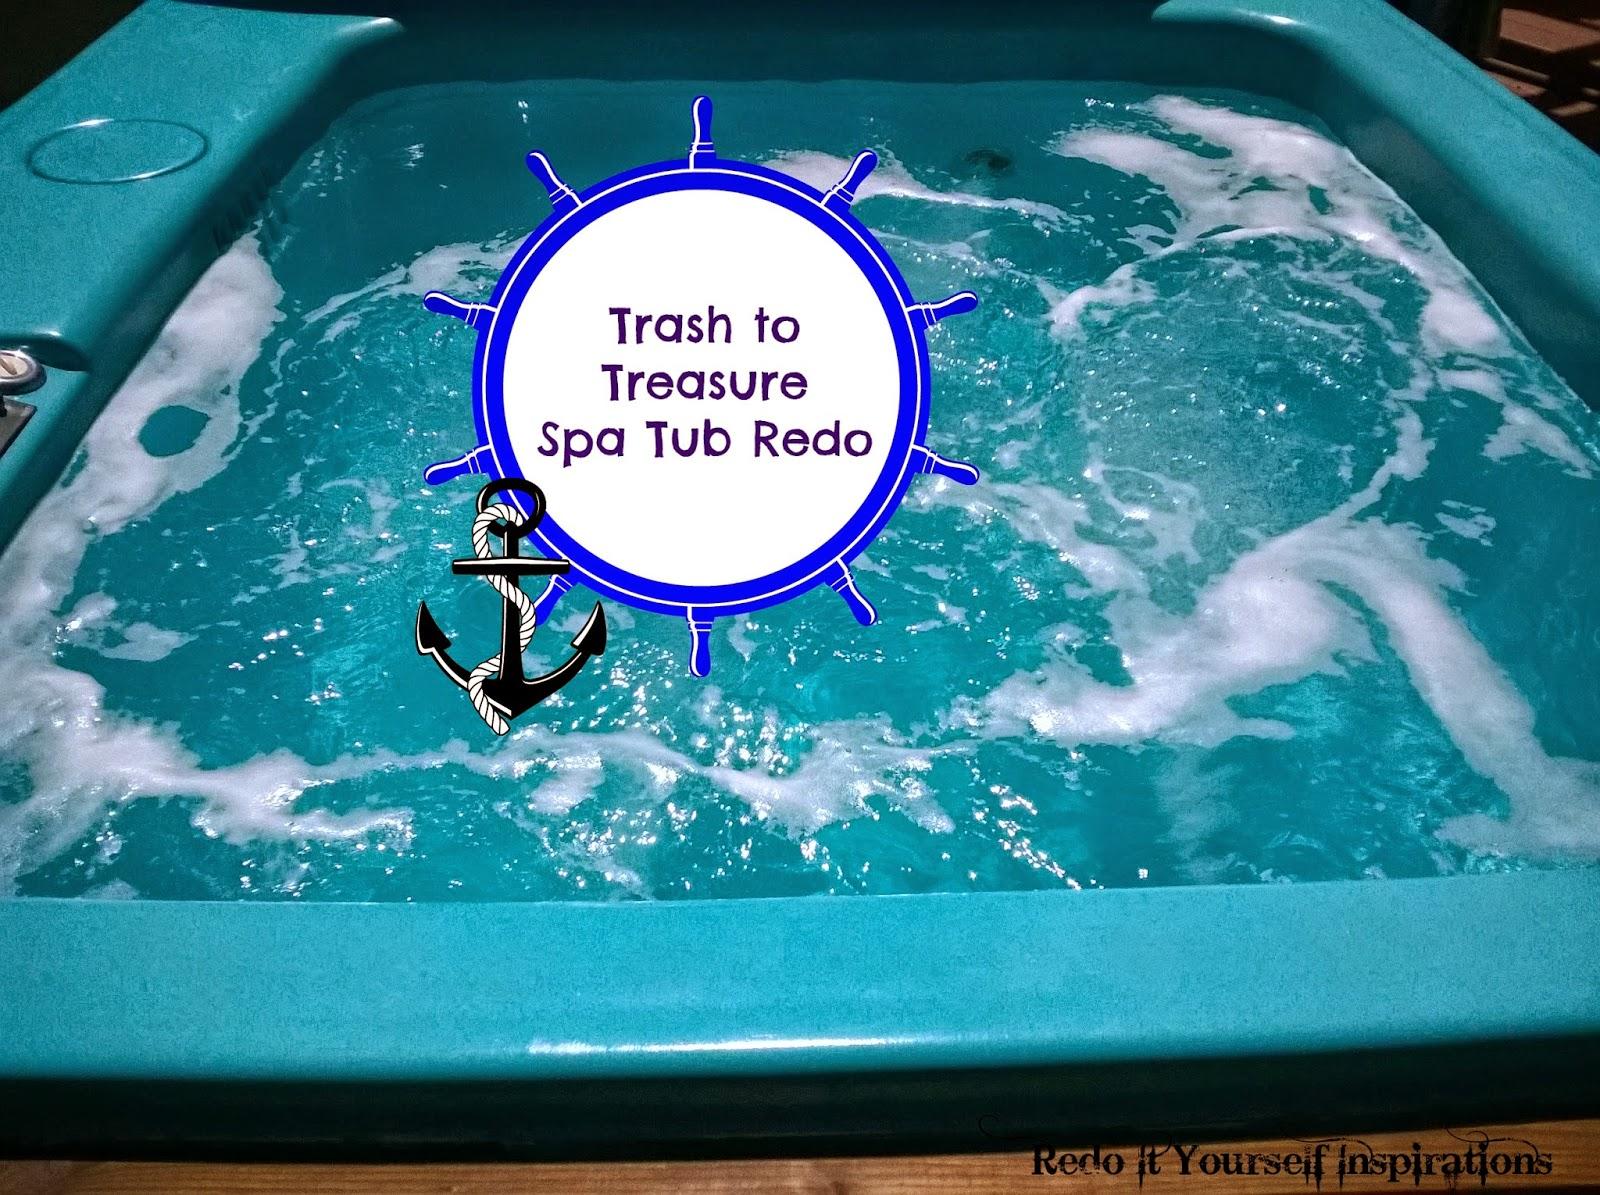 Spa Tub Redo | Redo It Yourself Inspirations : Spa Tub Redo